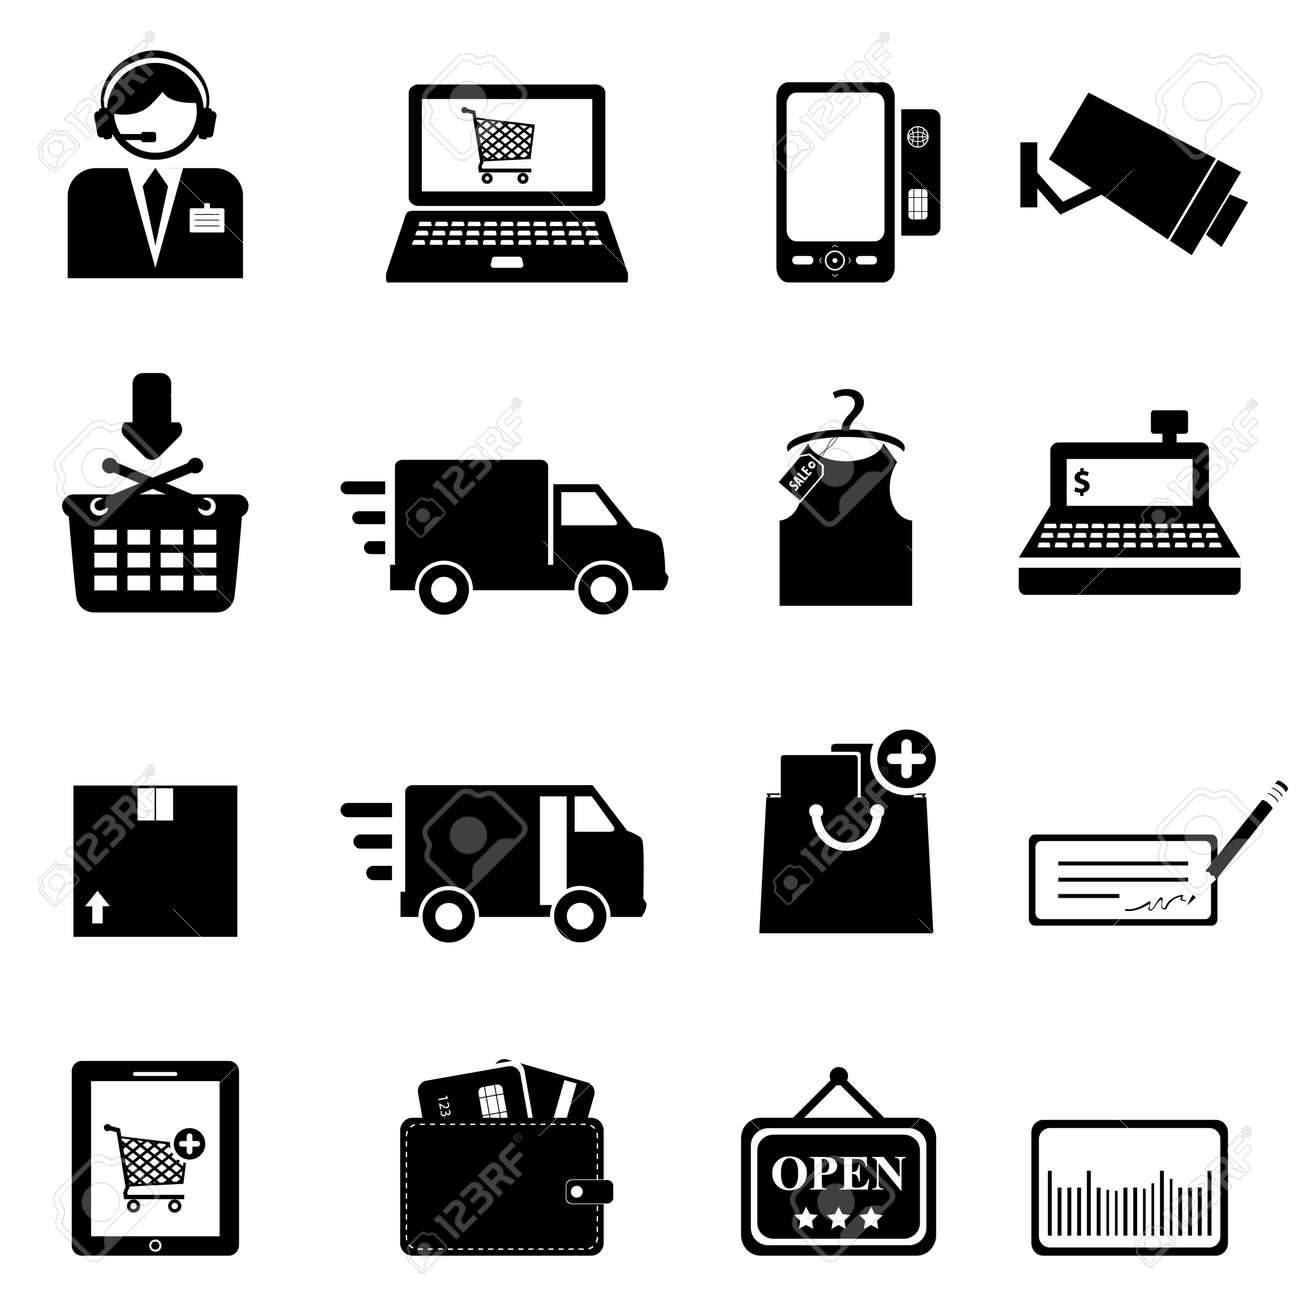 Shopping icon set in black - 16542817